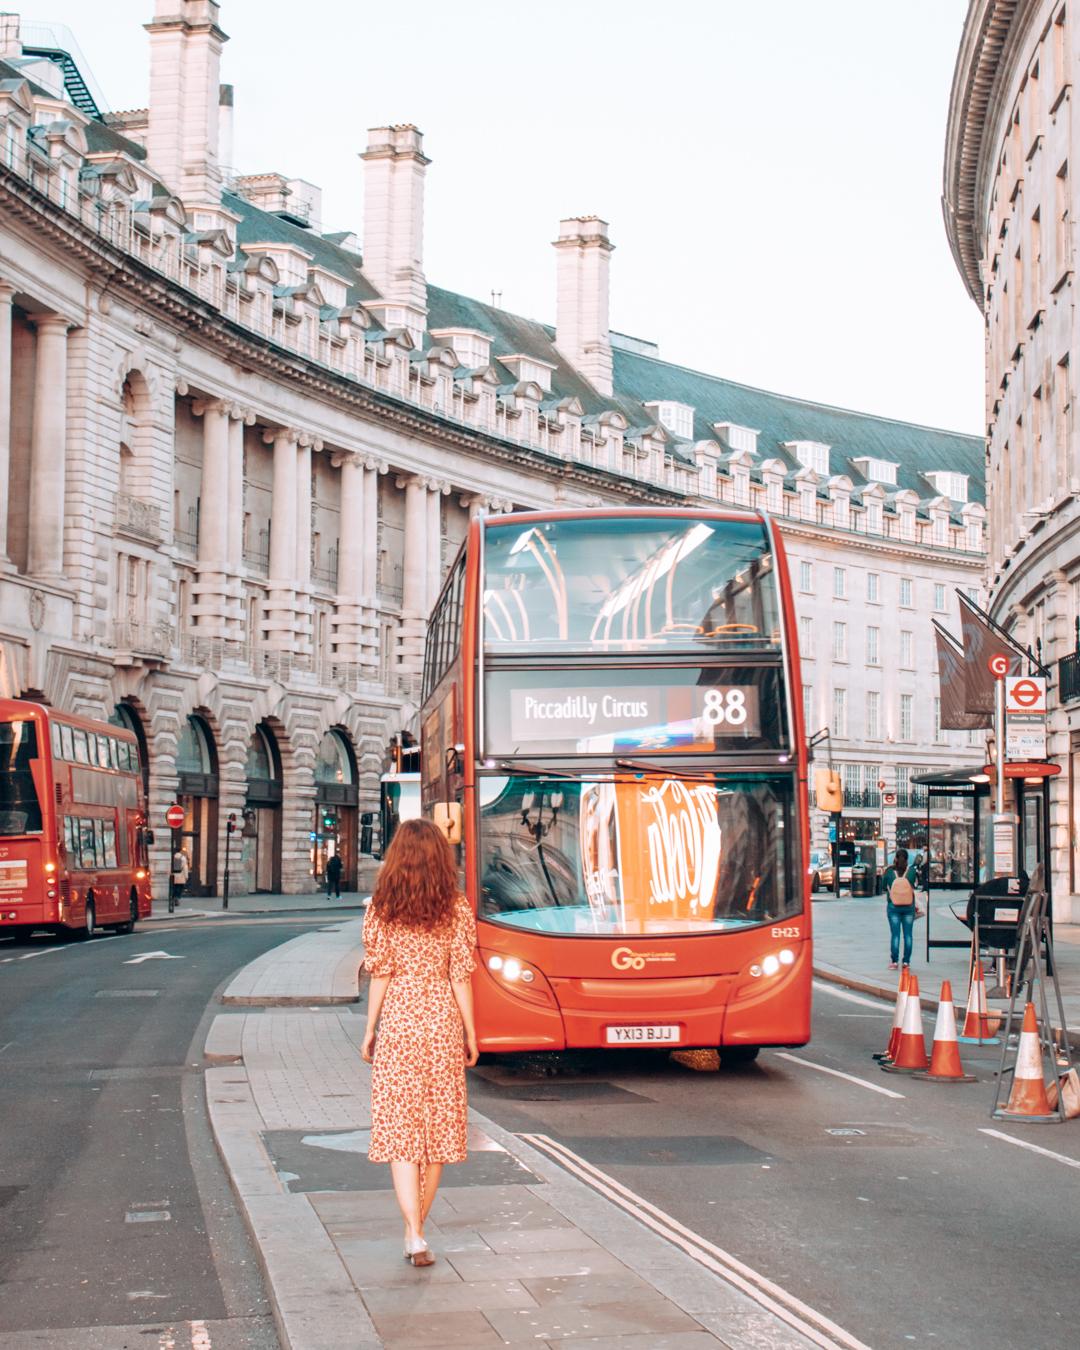 Red Double-Decker Bus in London